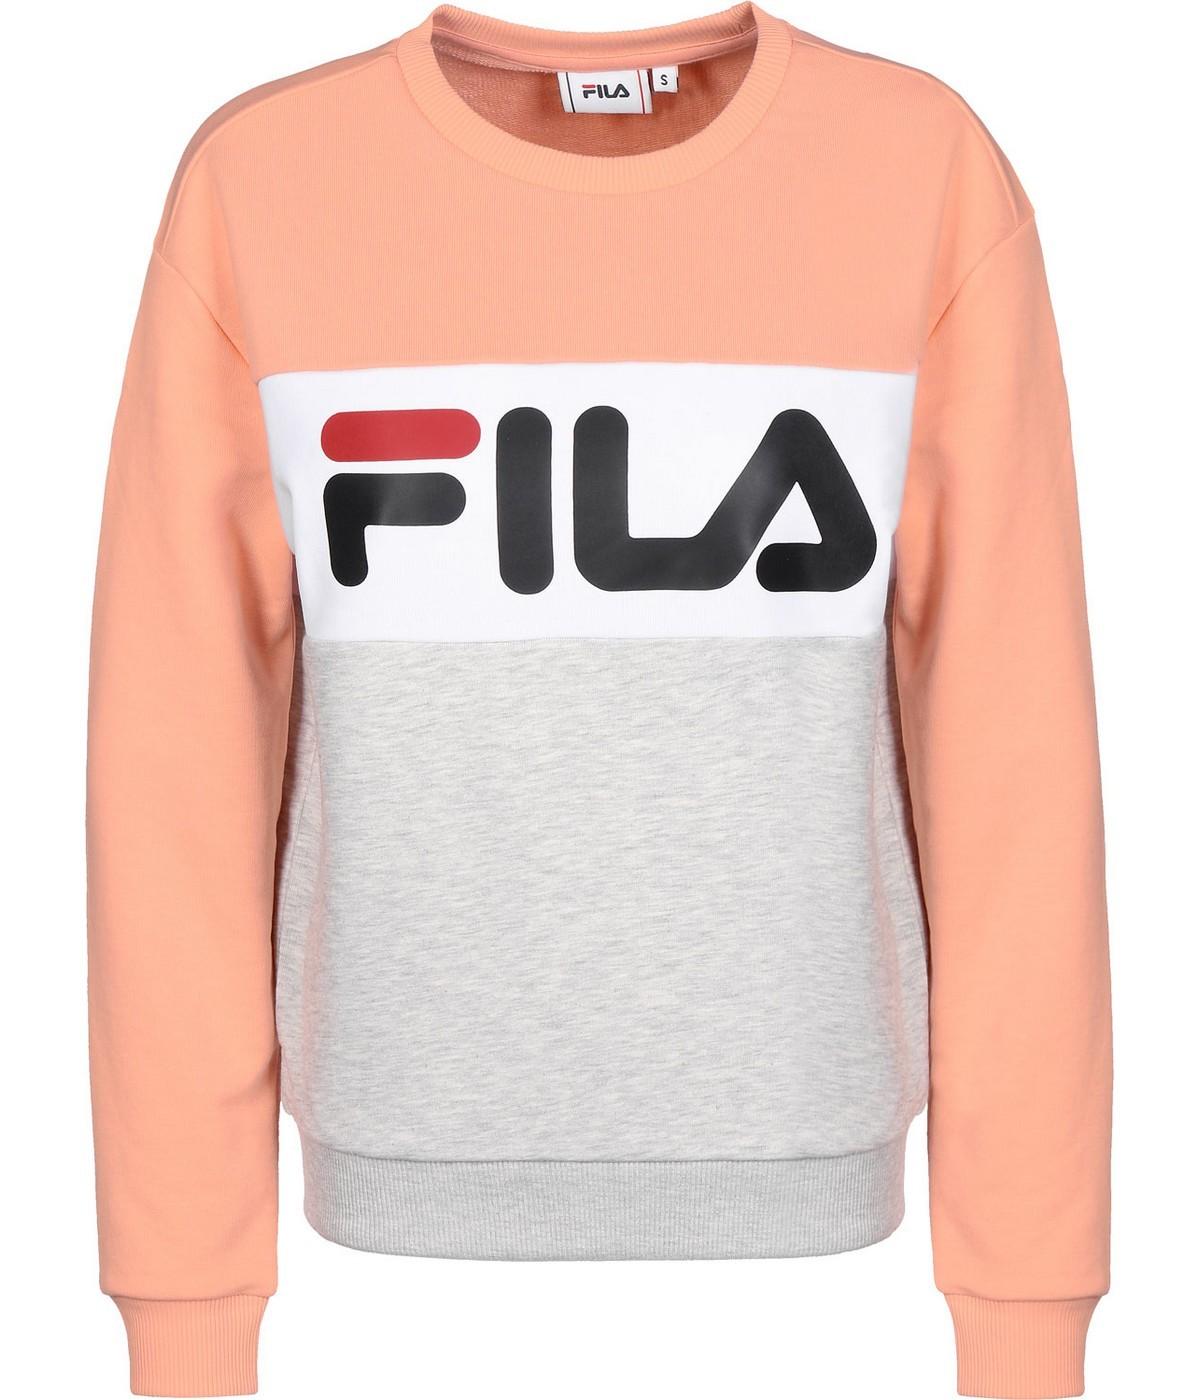 FILA SWEAT SHIRT FEMME leah crew sweat 687043